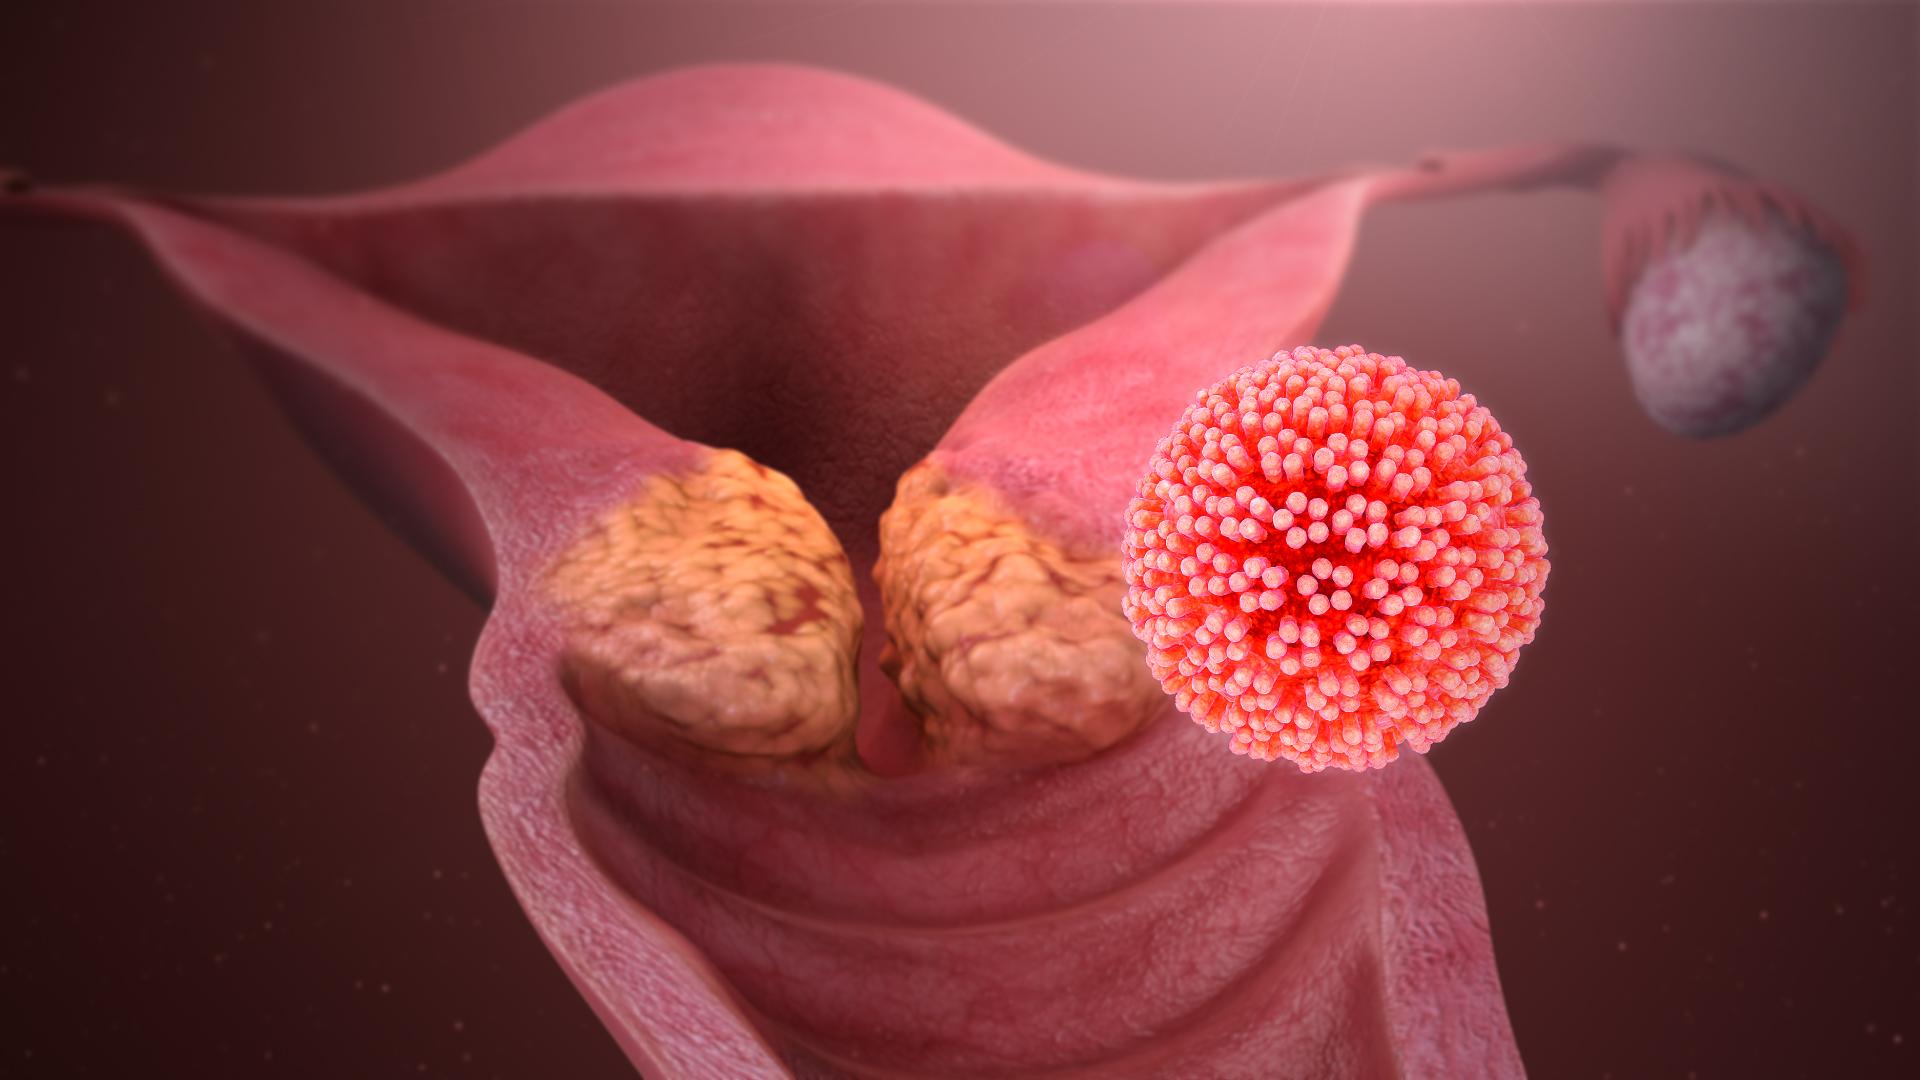 Asportazione papilloma gengivale. Dictionar Medical It-ro